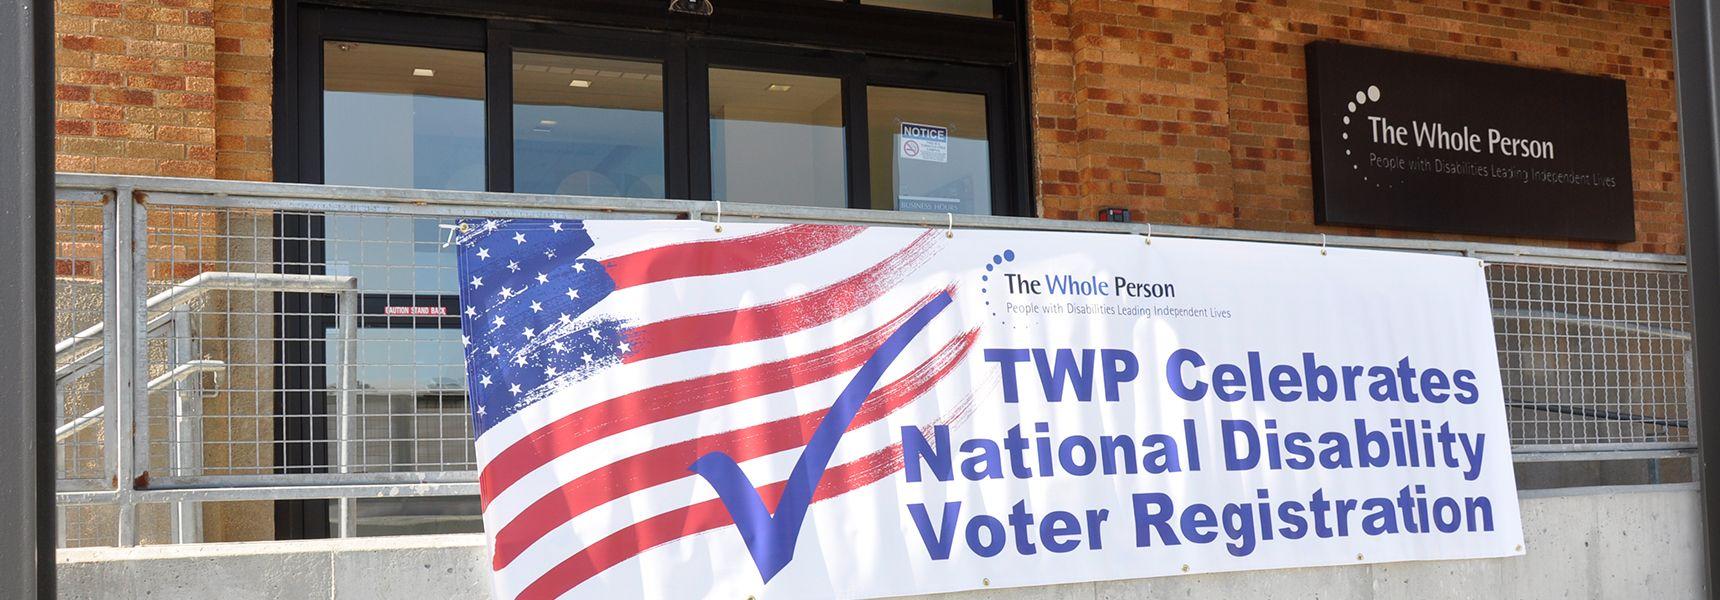 Red, white and blue banner celebrating national disability voter registration